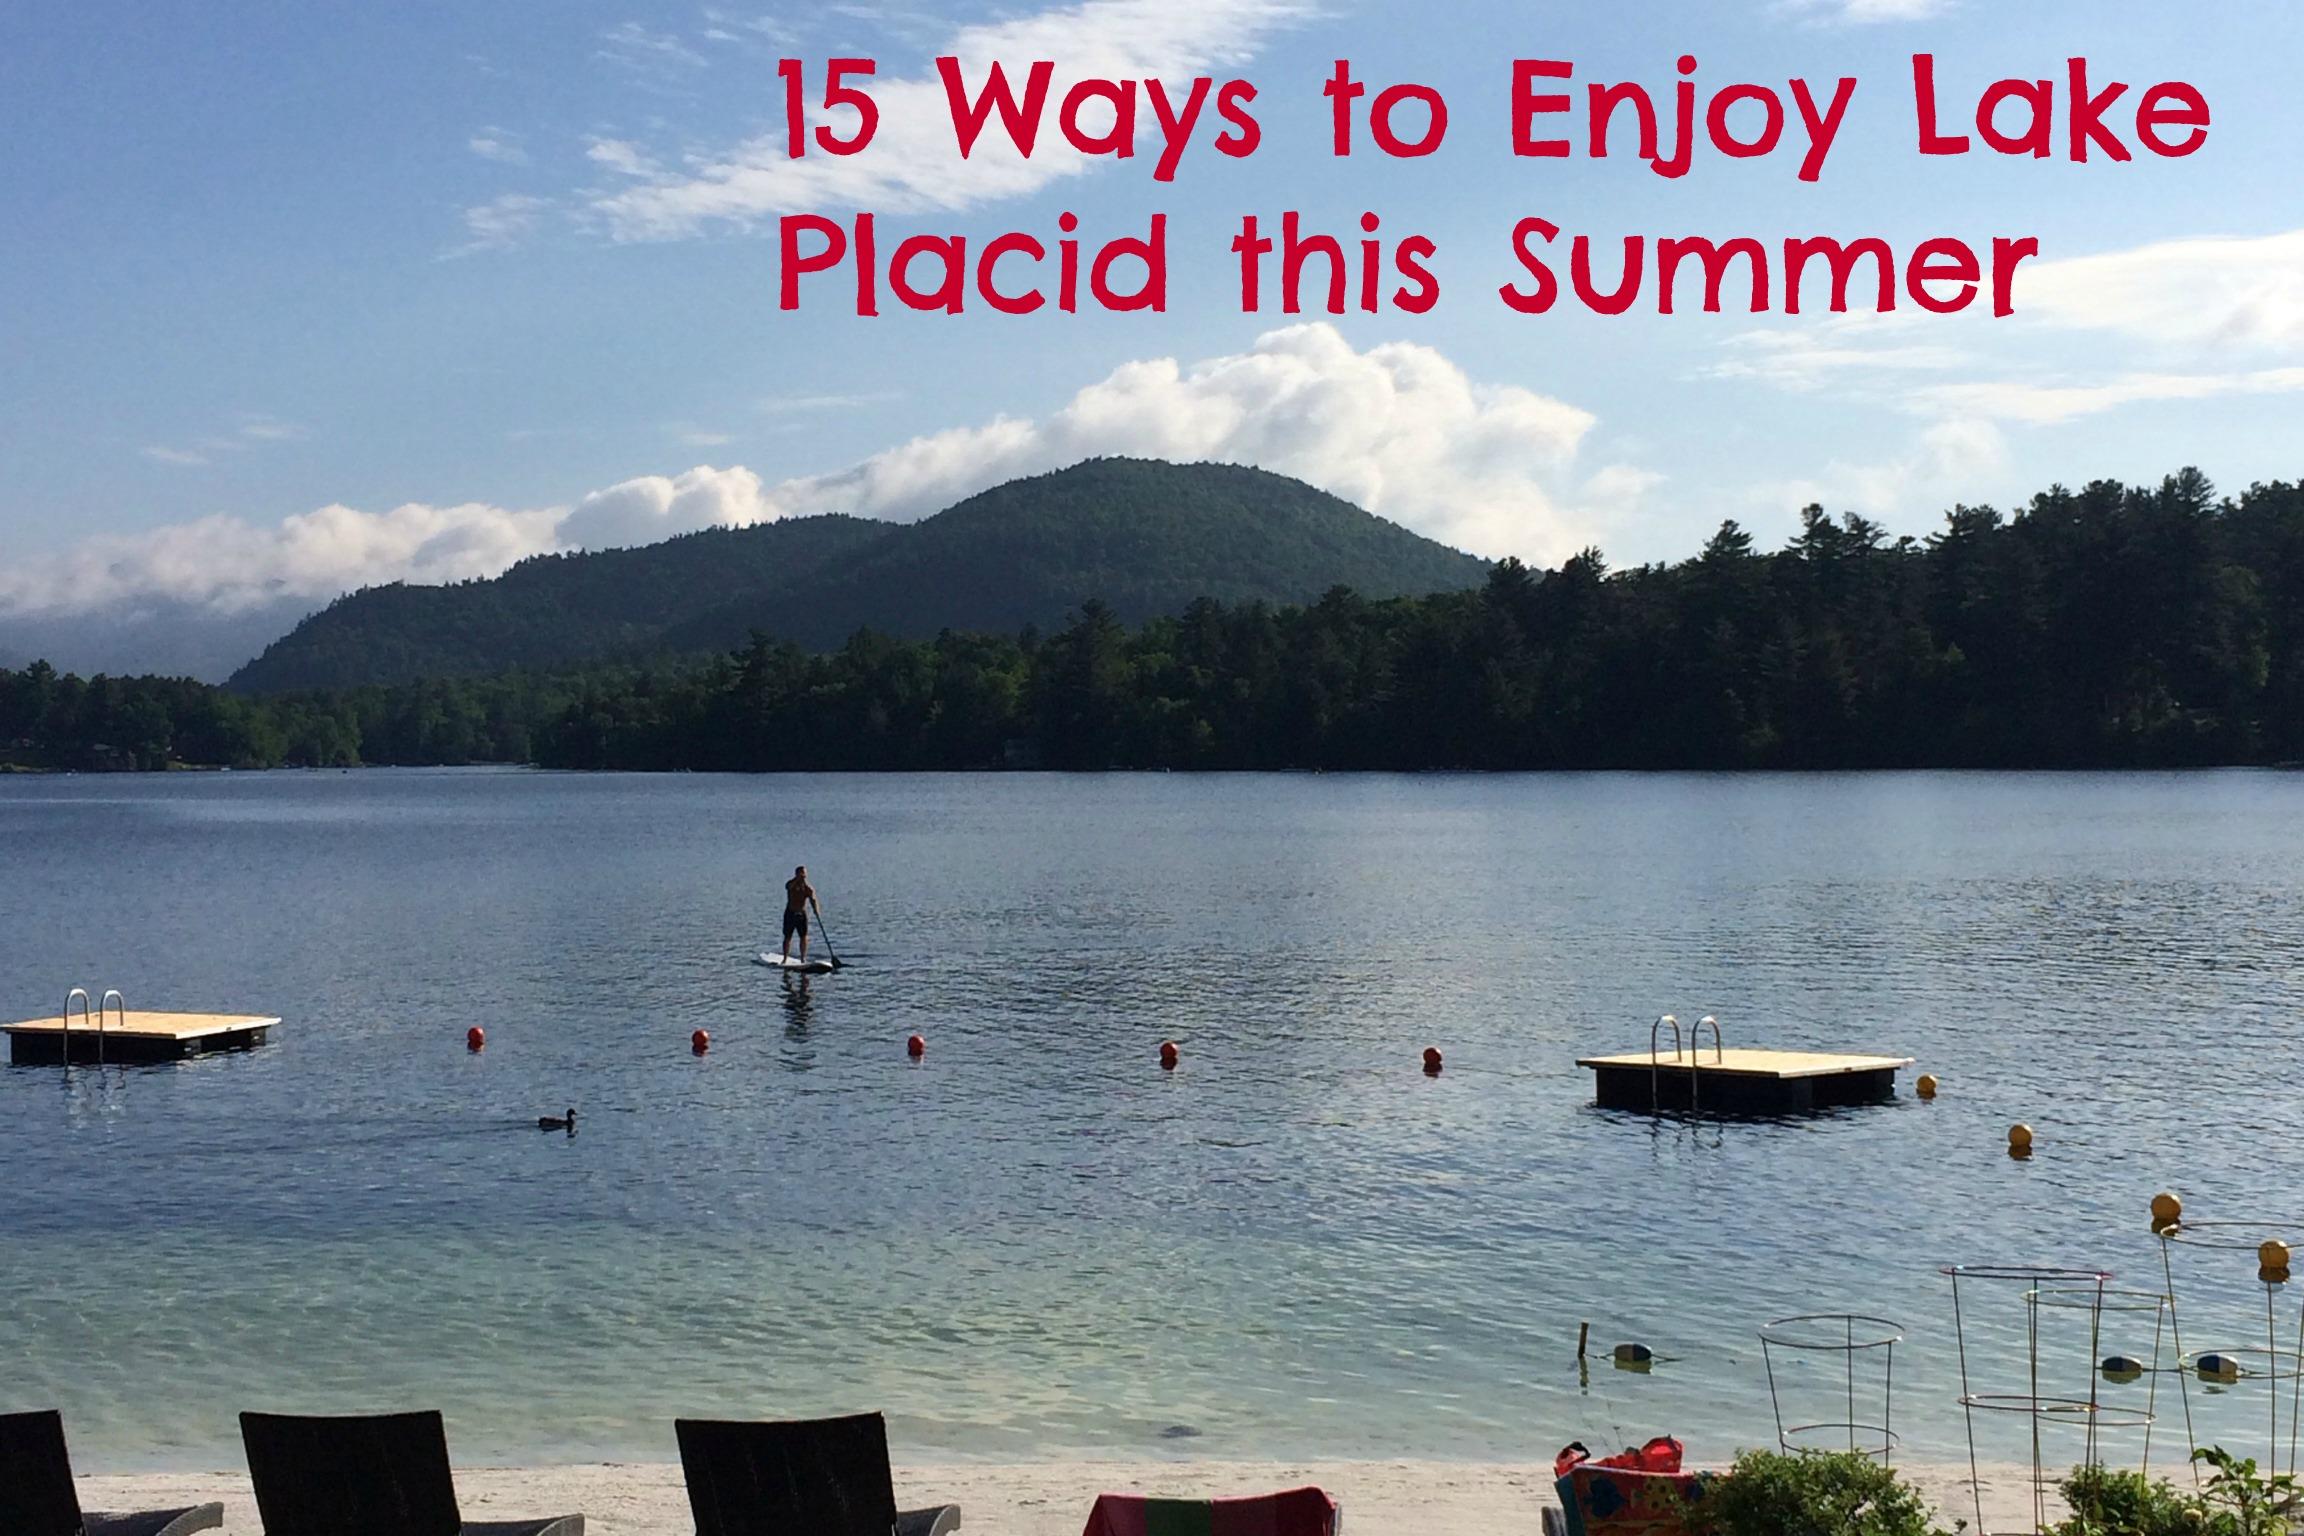 37 Ways To Savor Your Summer: 15 Ways To Enjoy Lake Placid This Summer